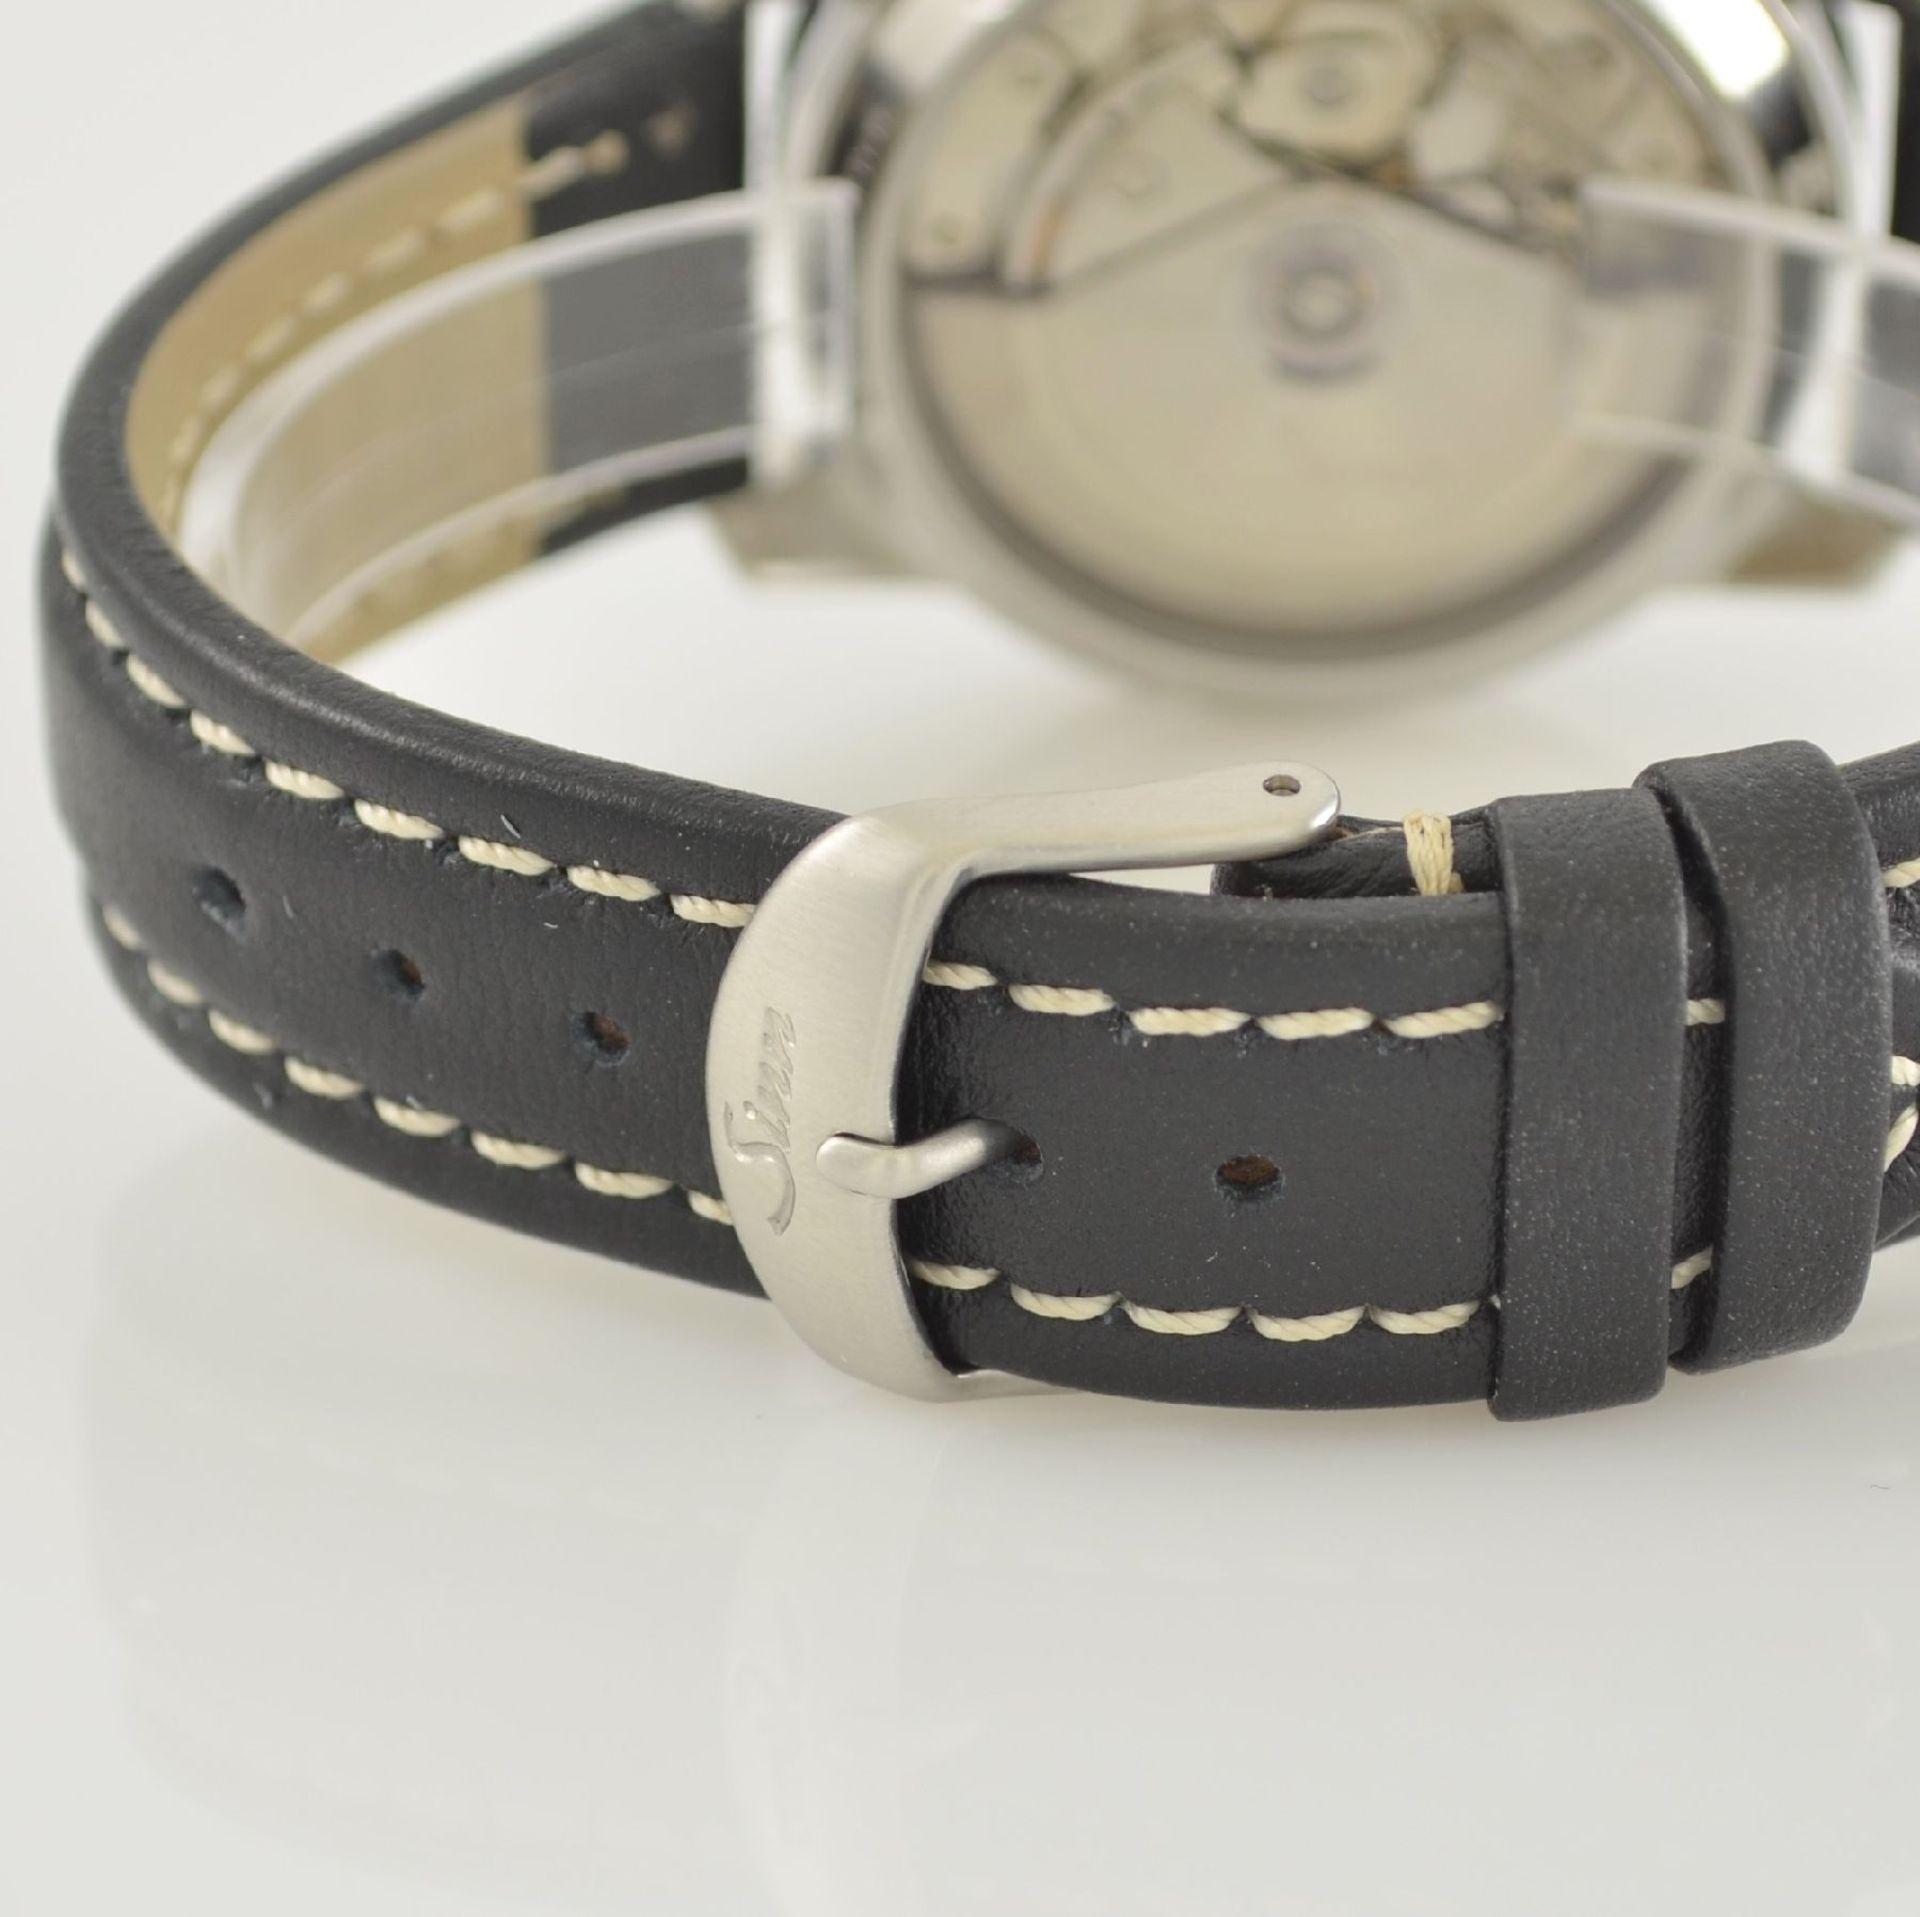 SINN Armbandchronograph, Automatik, Schweiz um 2010, pol. Edelstahlgeh. inkl. orig. Lederband m. - Bild 5 aus 6